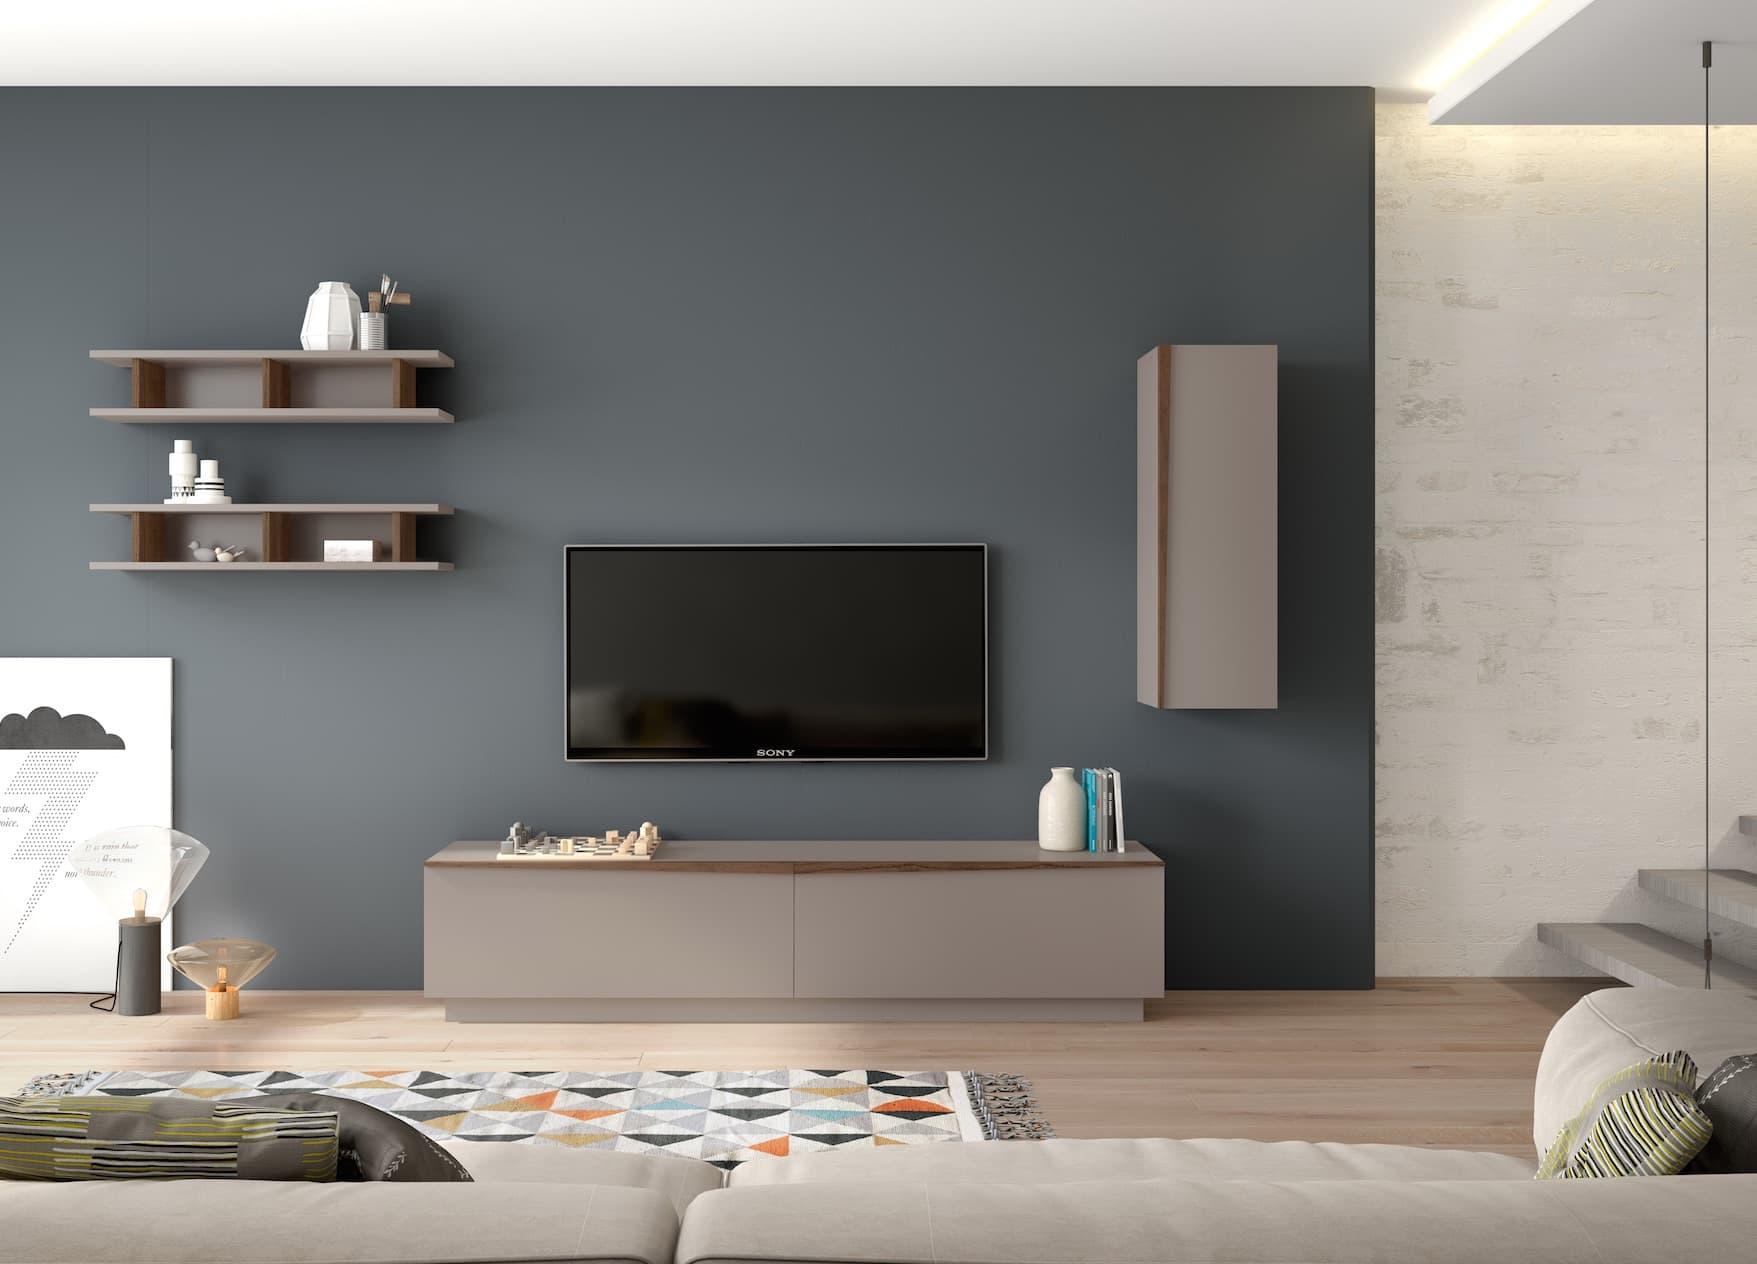 salon meuble tv milan meuble tv avec deux portes porte horizontal. Black Bedroom Furniture Sets. Home Design Ideas